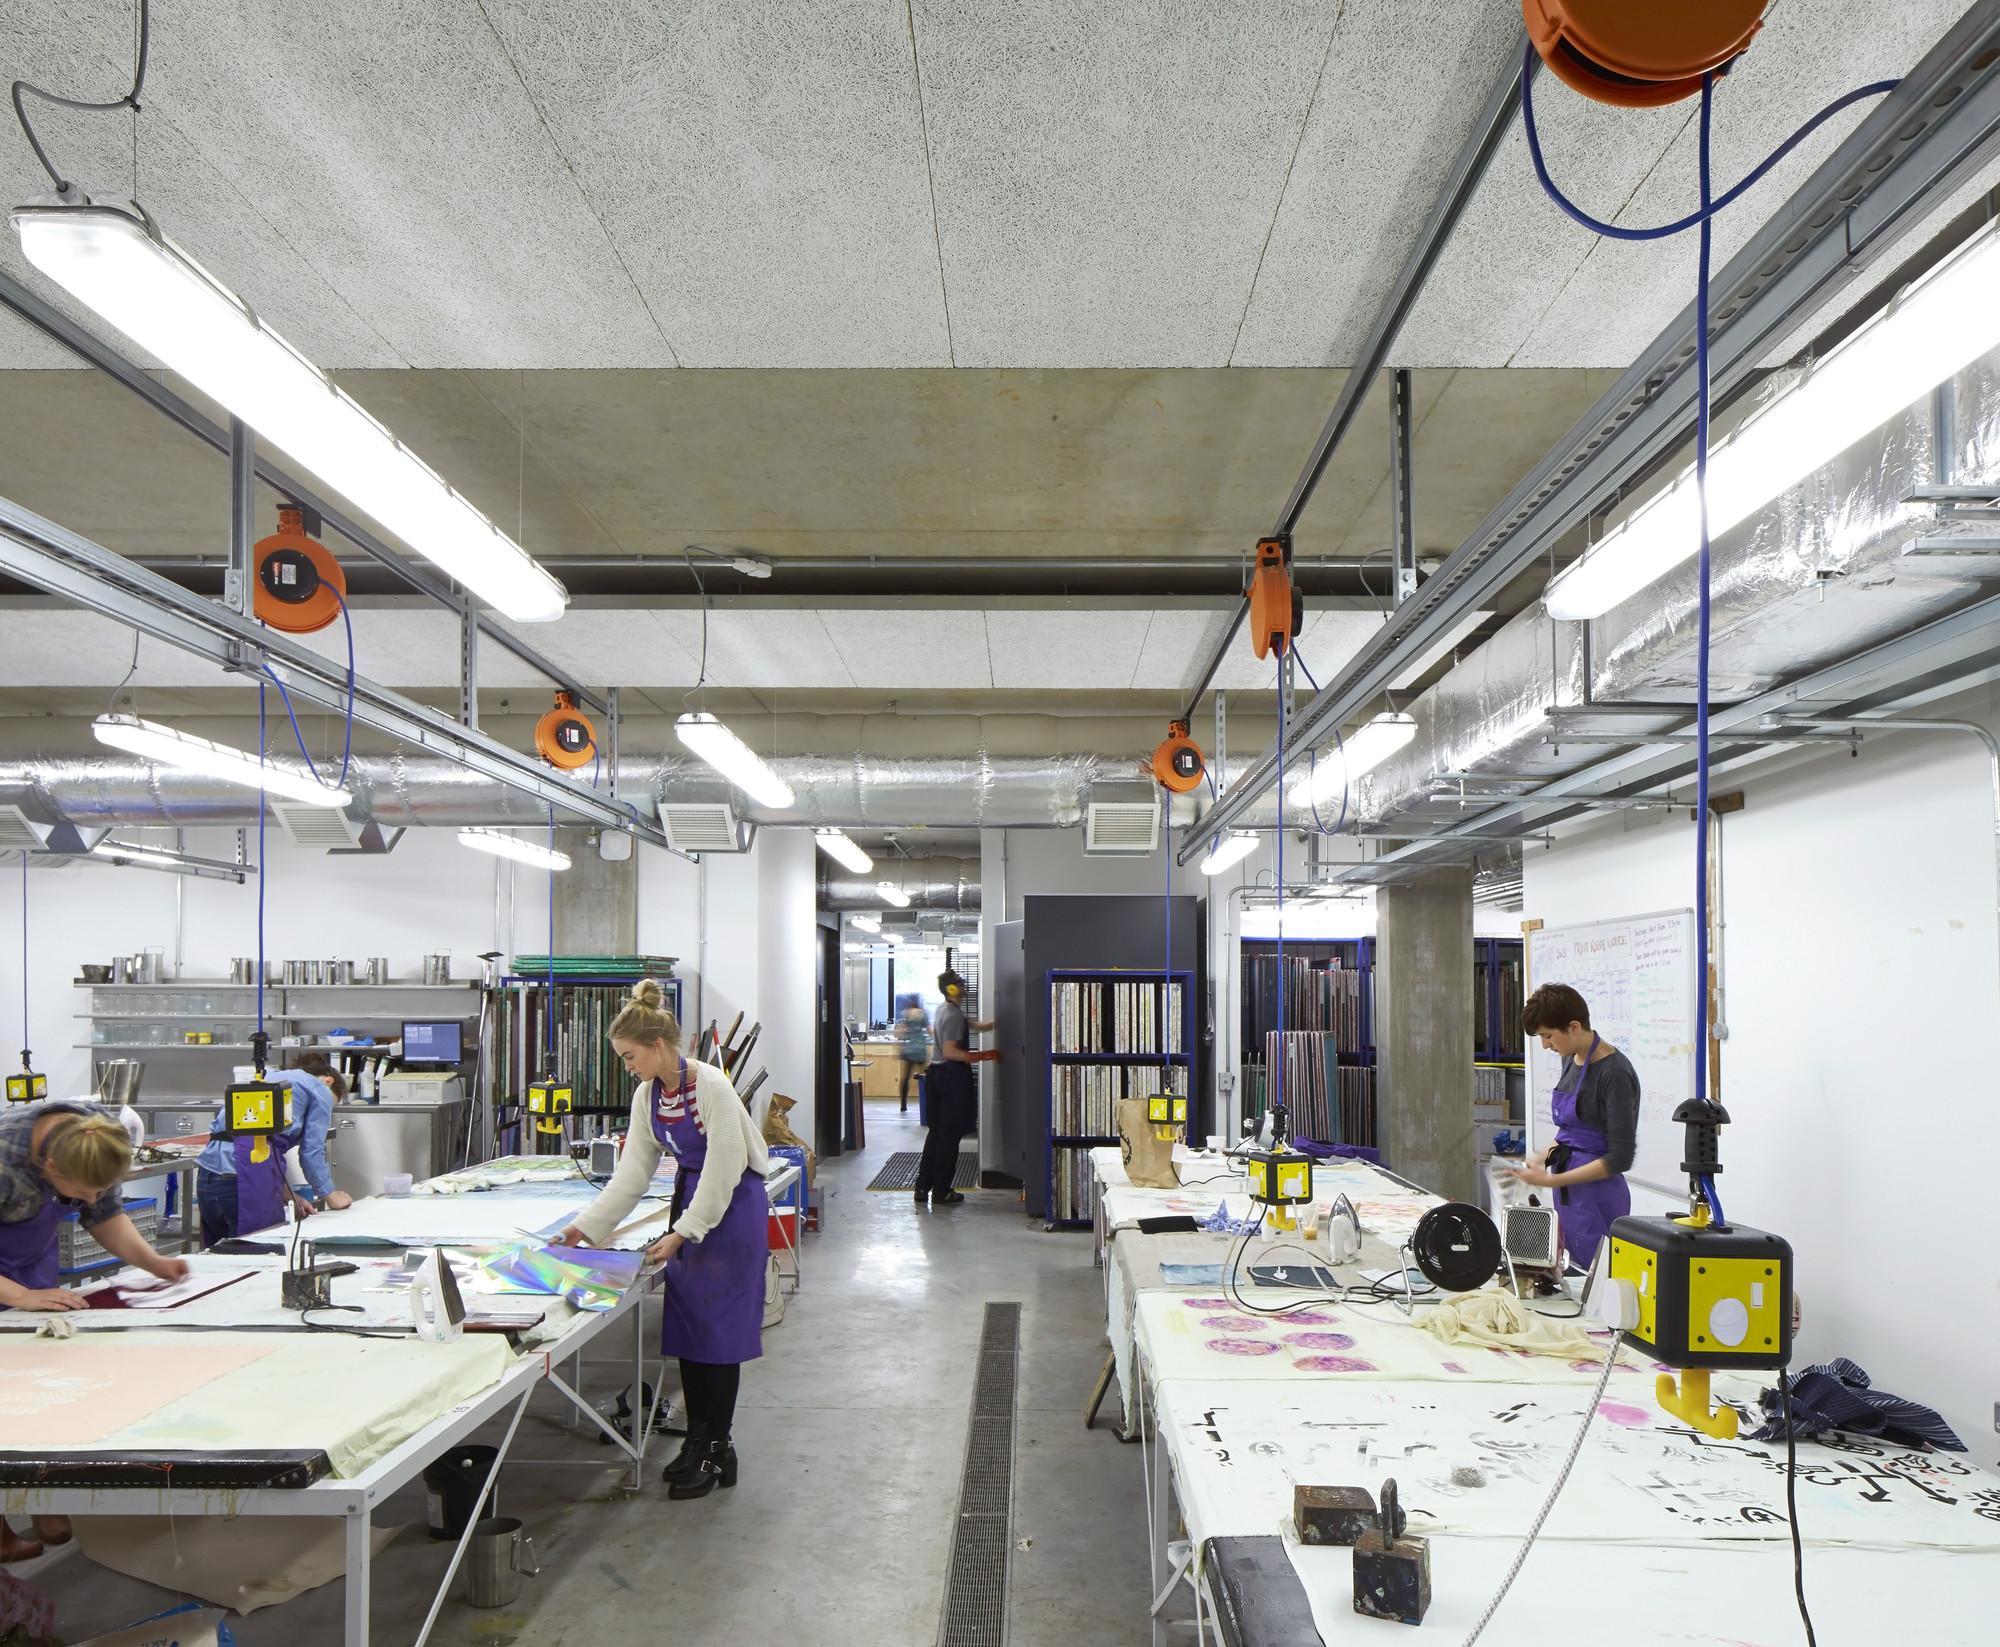 Gallery Of Manchester School Of Art Feilden Clegg Bradley Studios 27